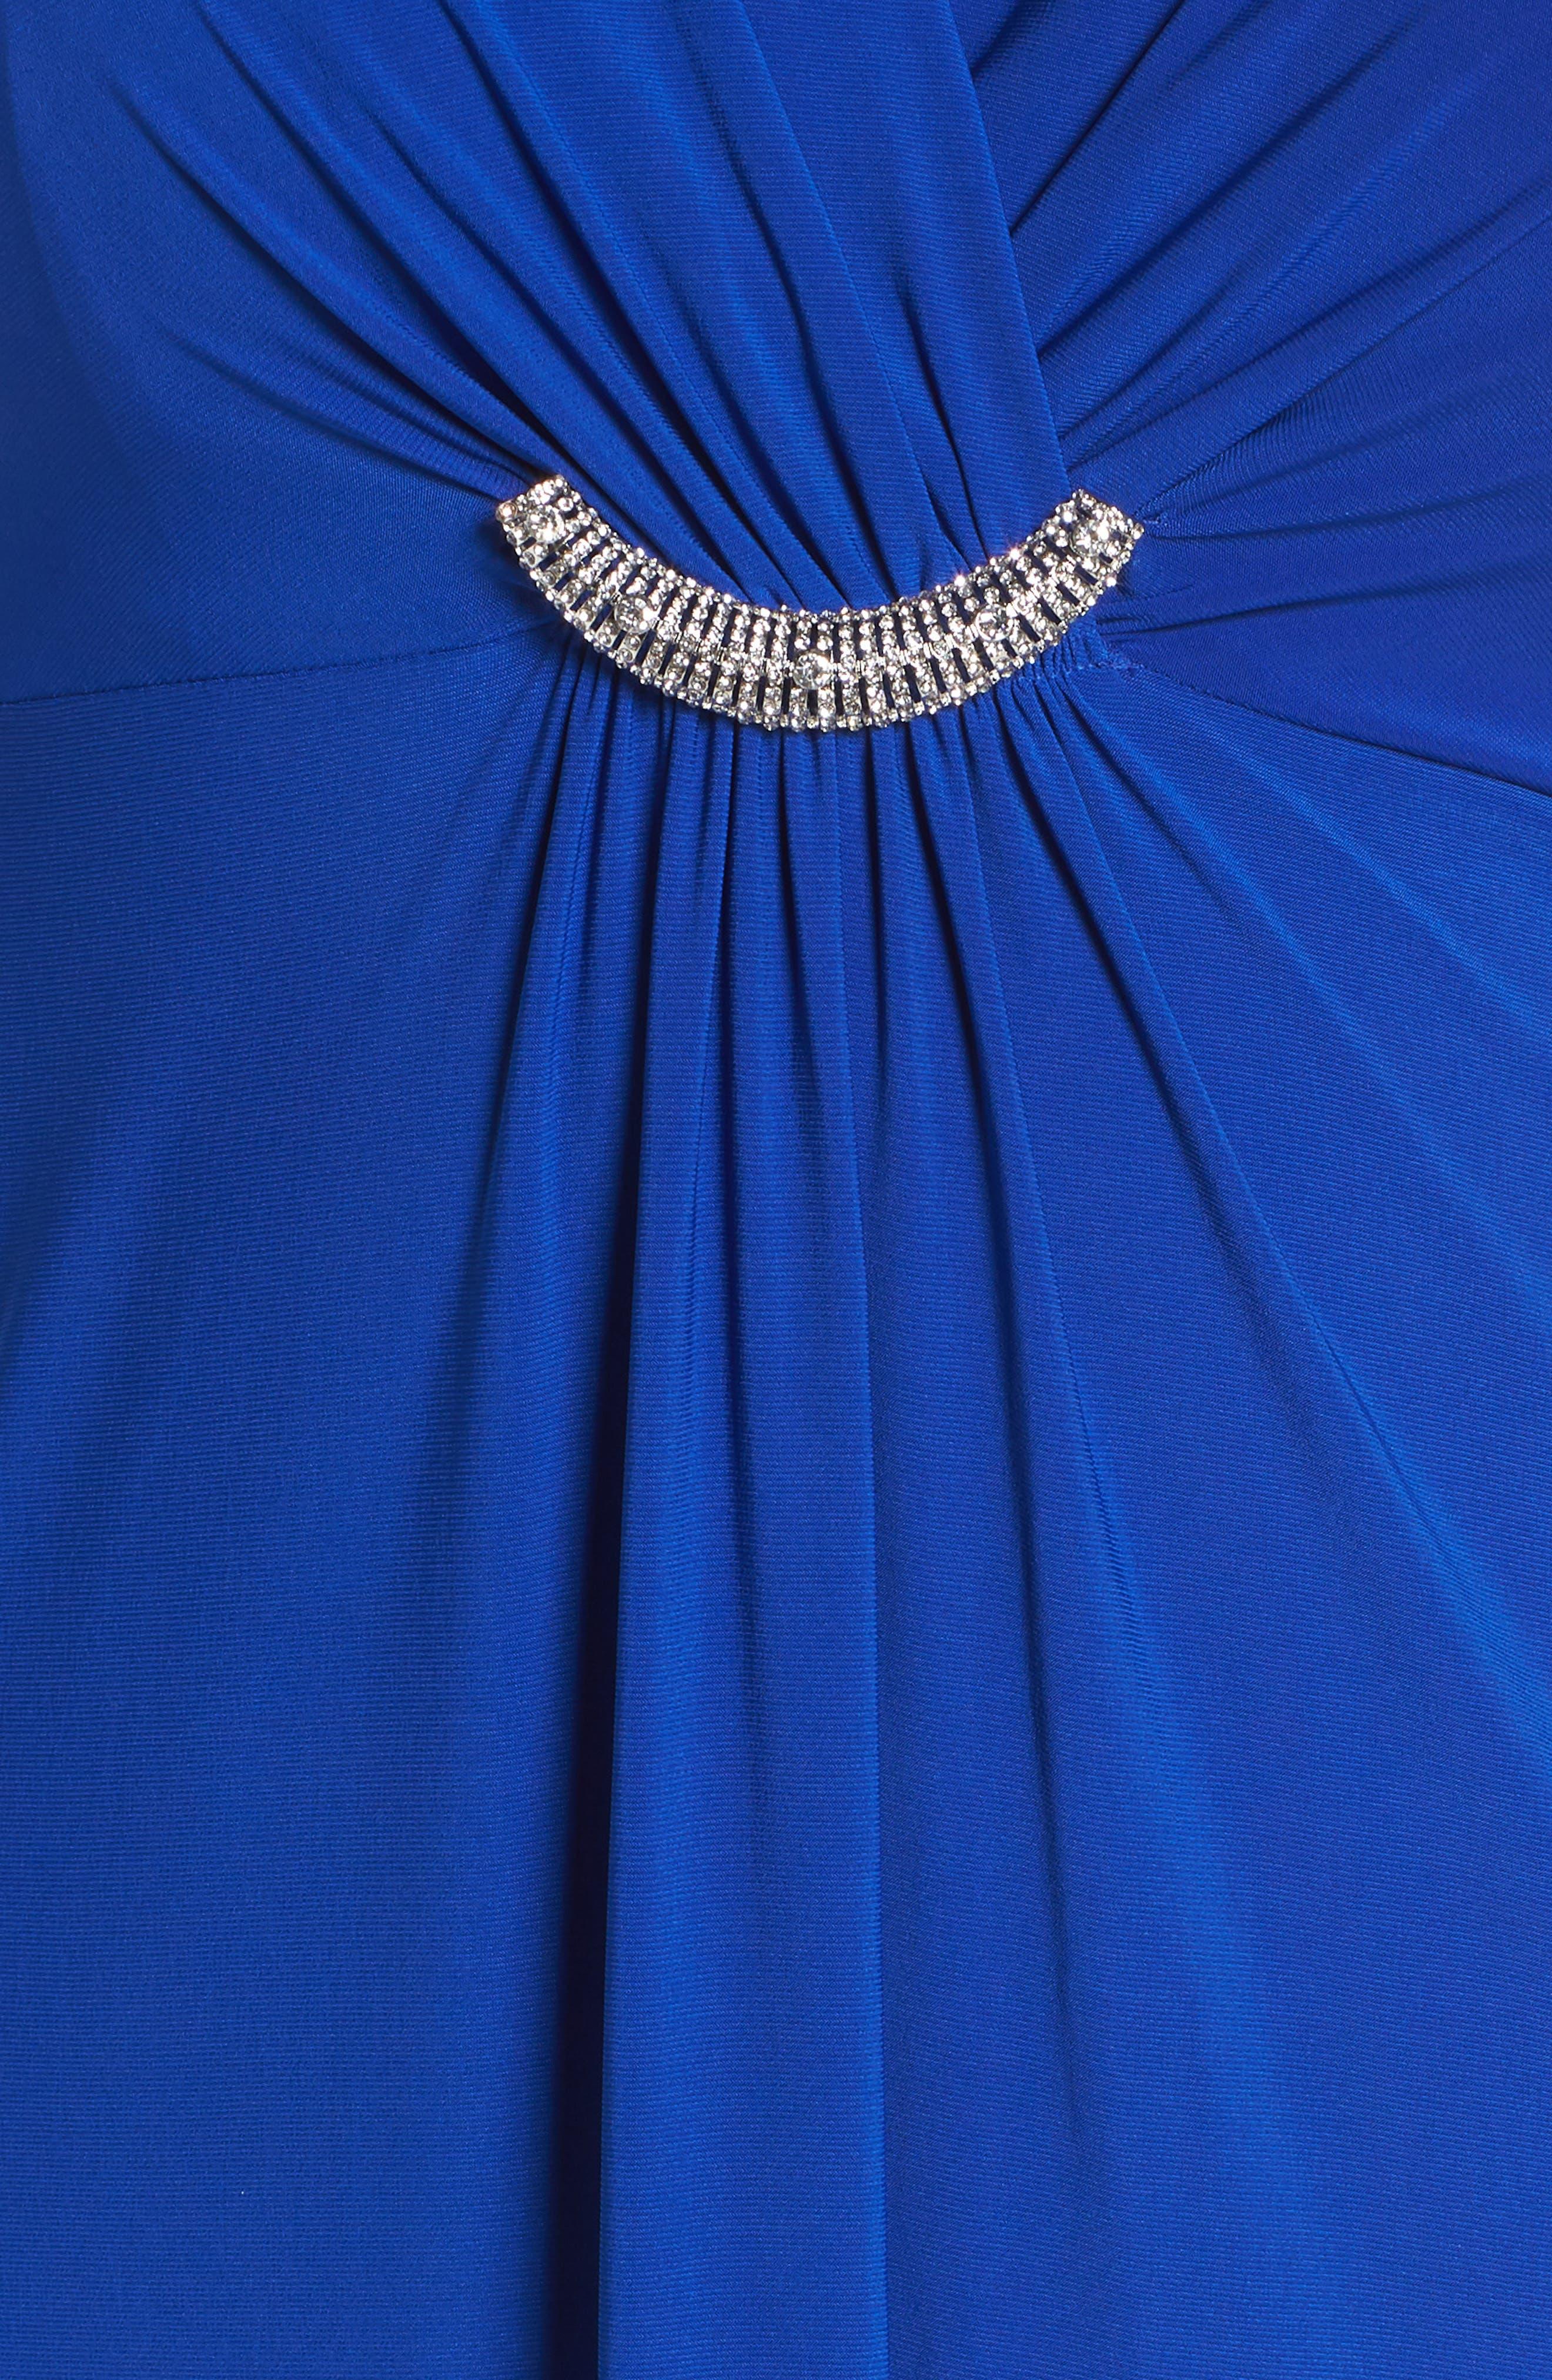 Embellished Surplice Dress,                             Alternate thumbnail 6, color,                             430